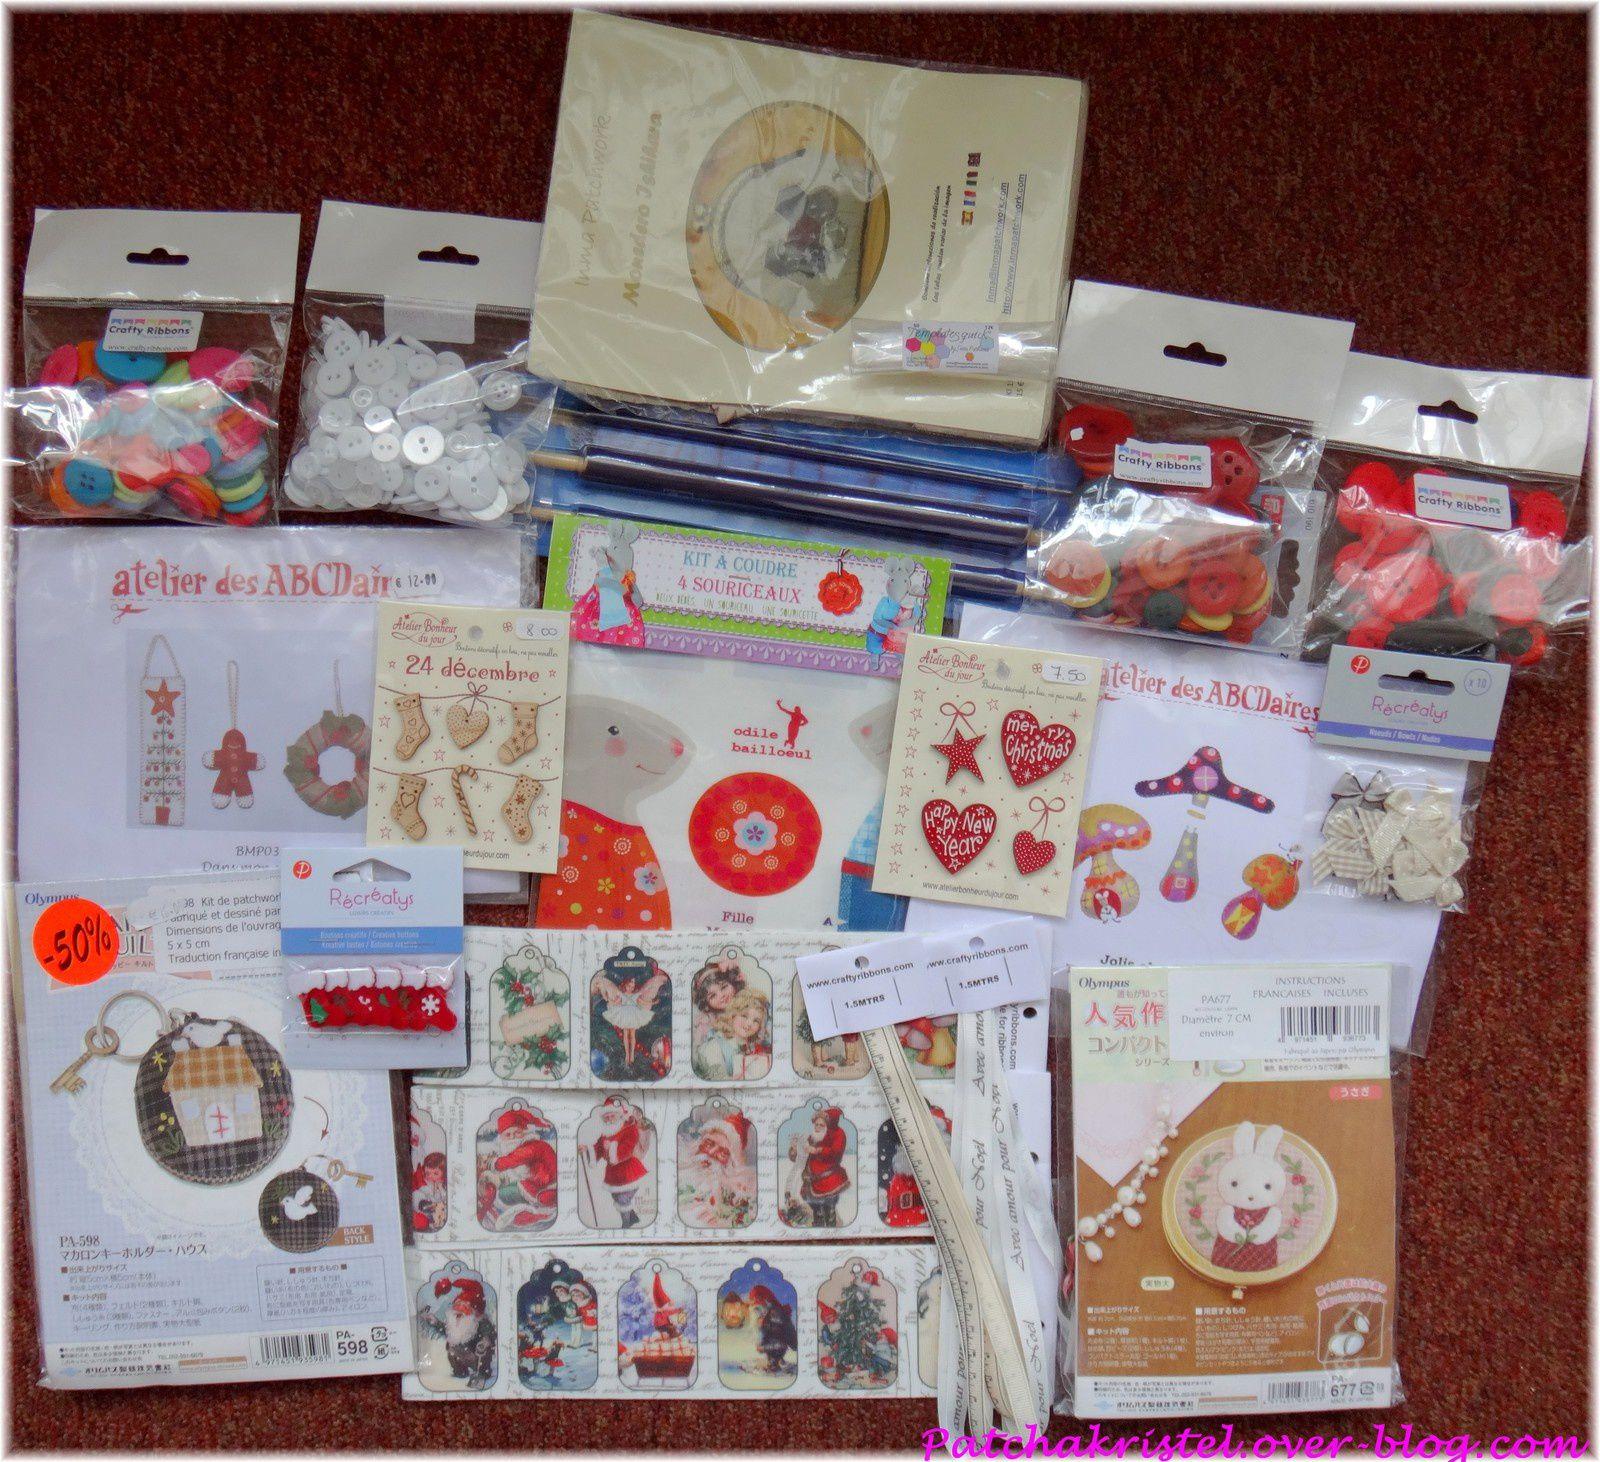 CSF - boutons, kits patchwork, kits feutrine, rubans british